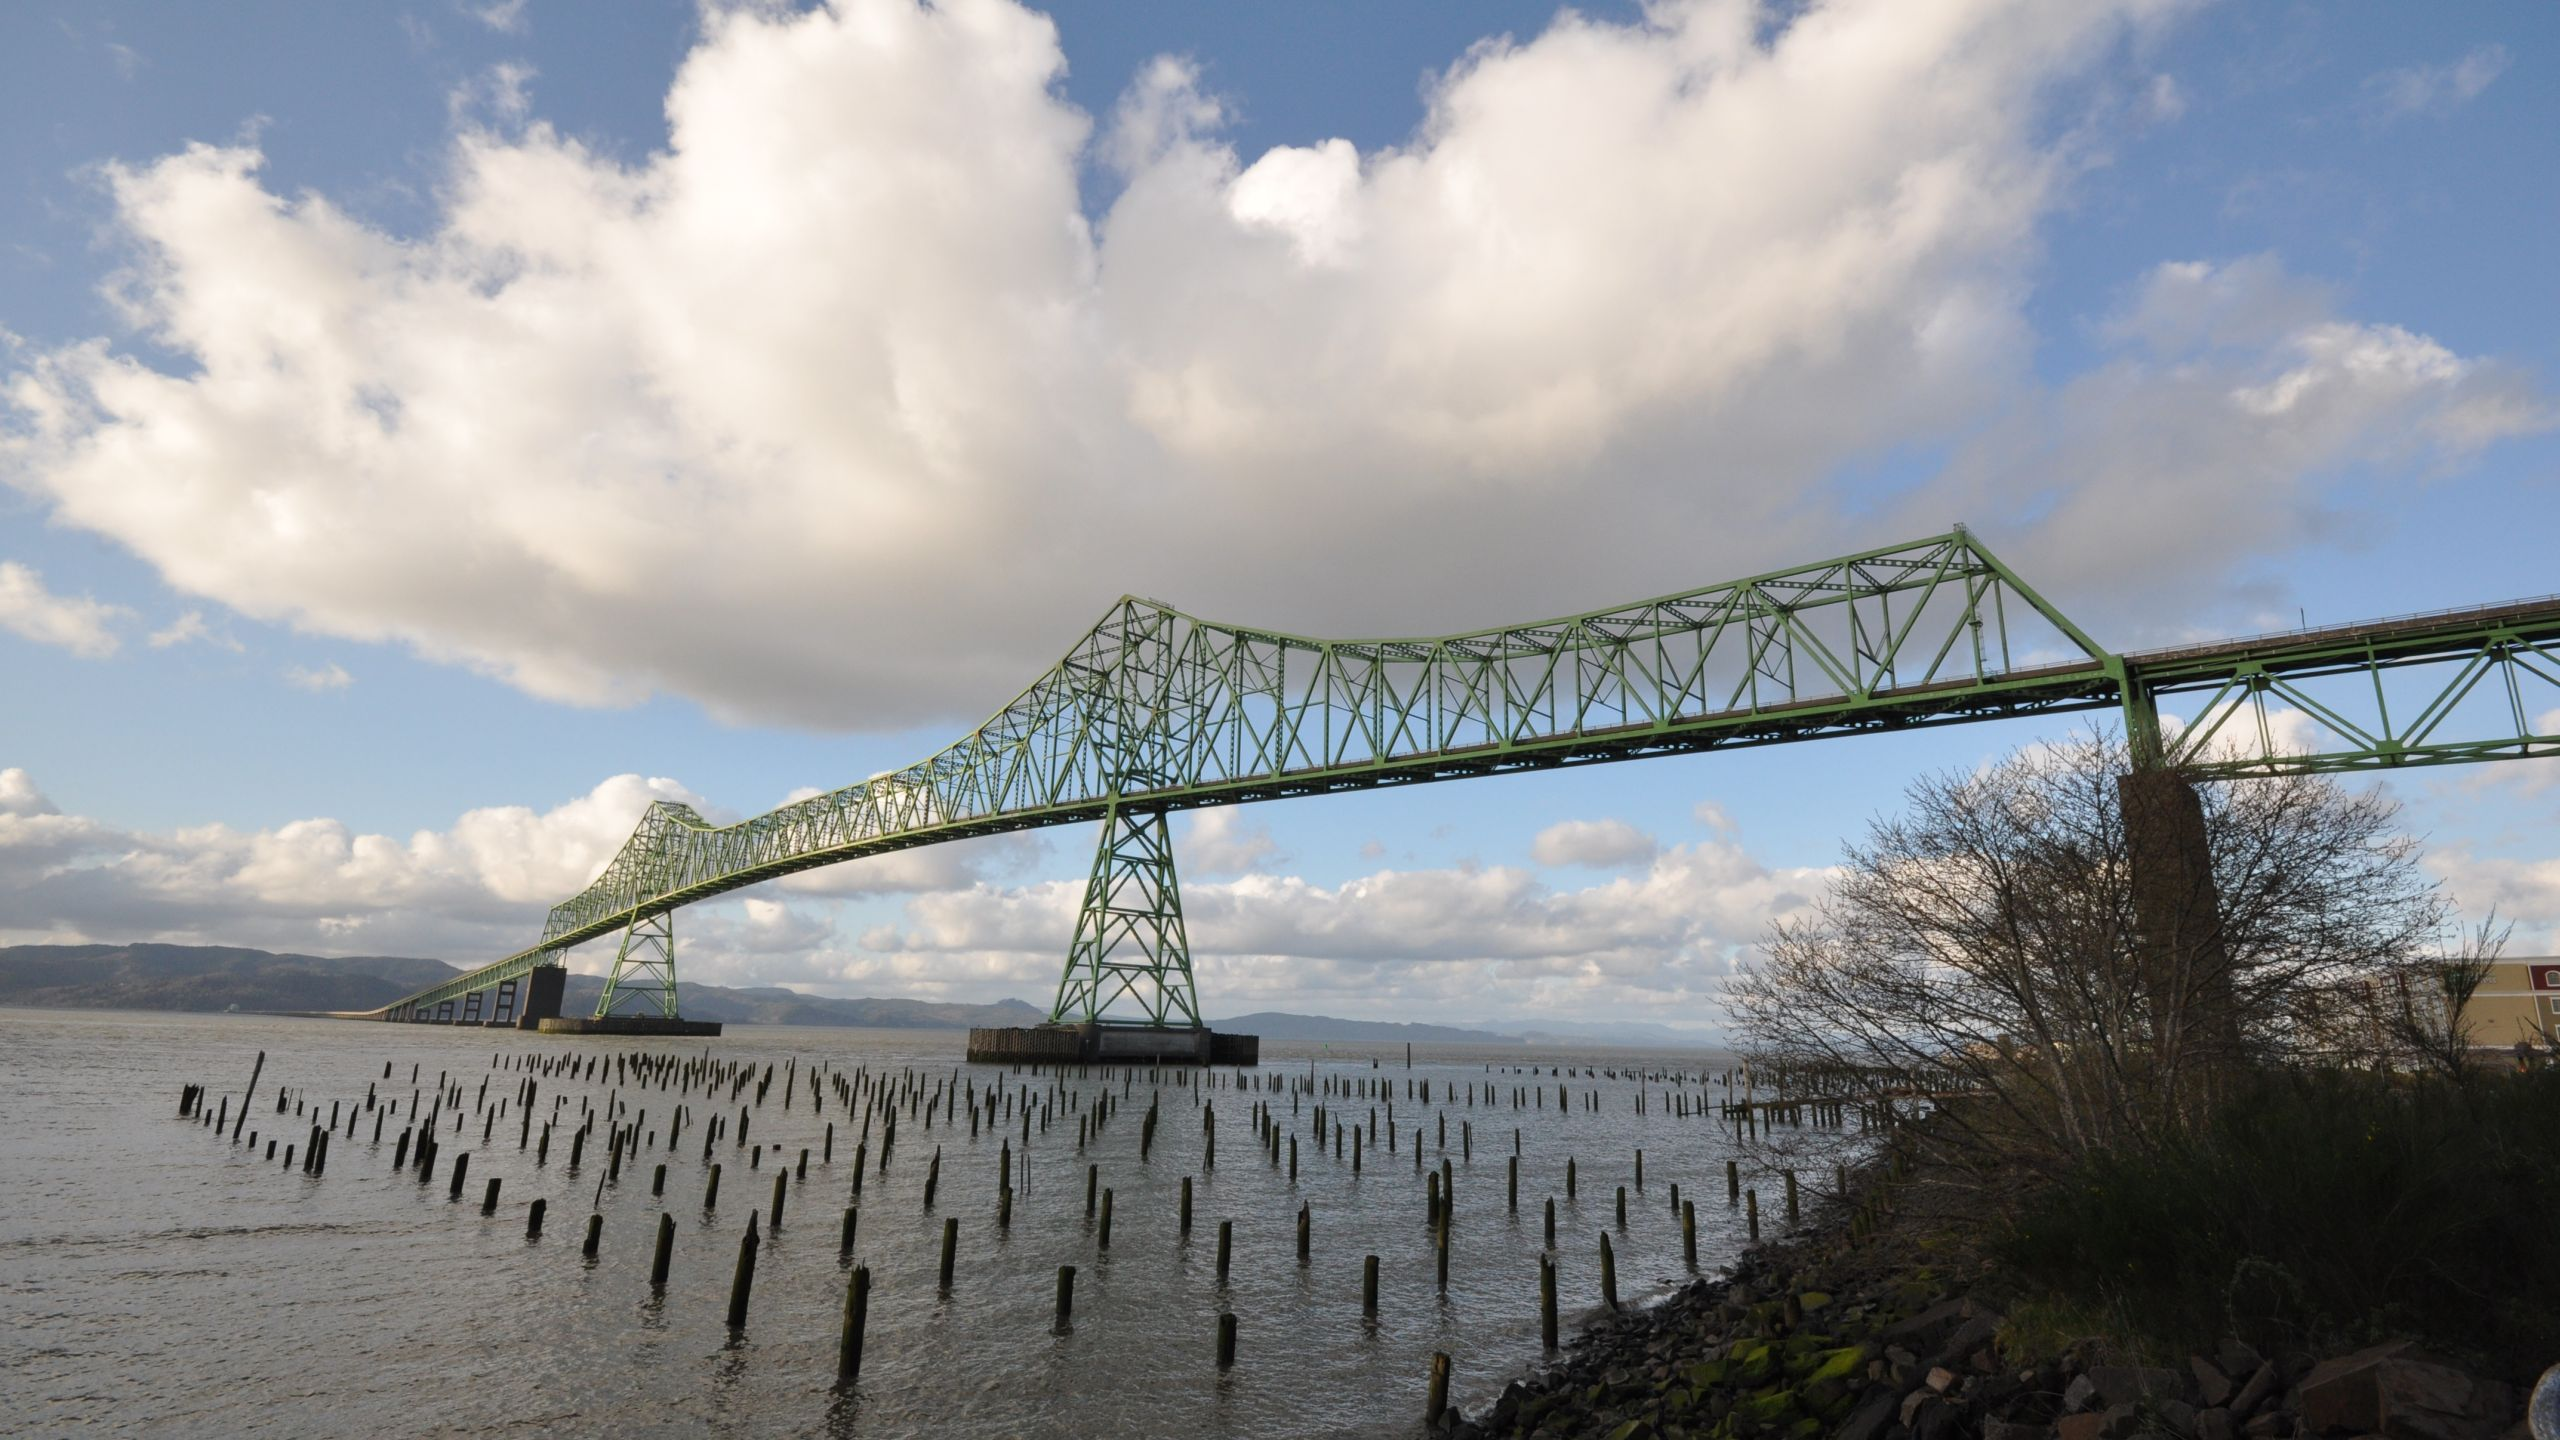 AstoriaMegler Bridge HD Wallpaper Background Image 2560x1440 2560x1440